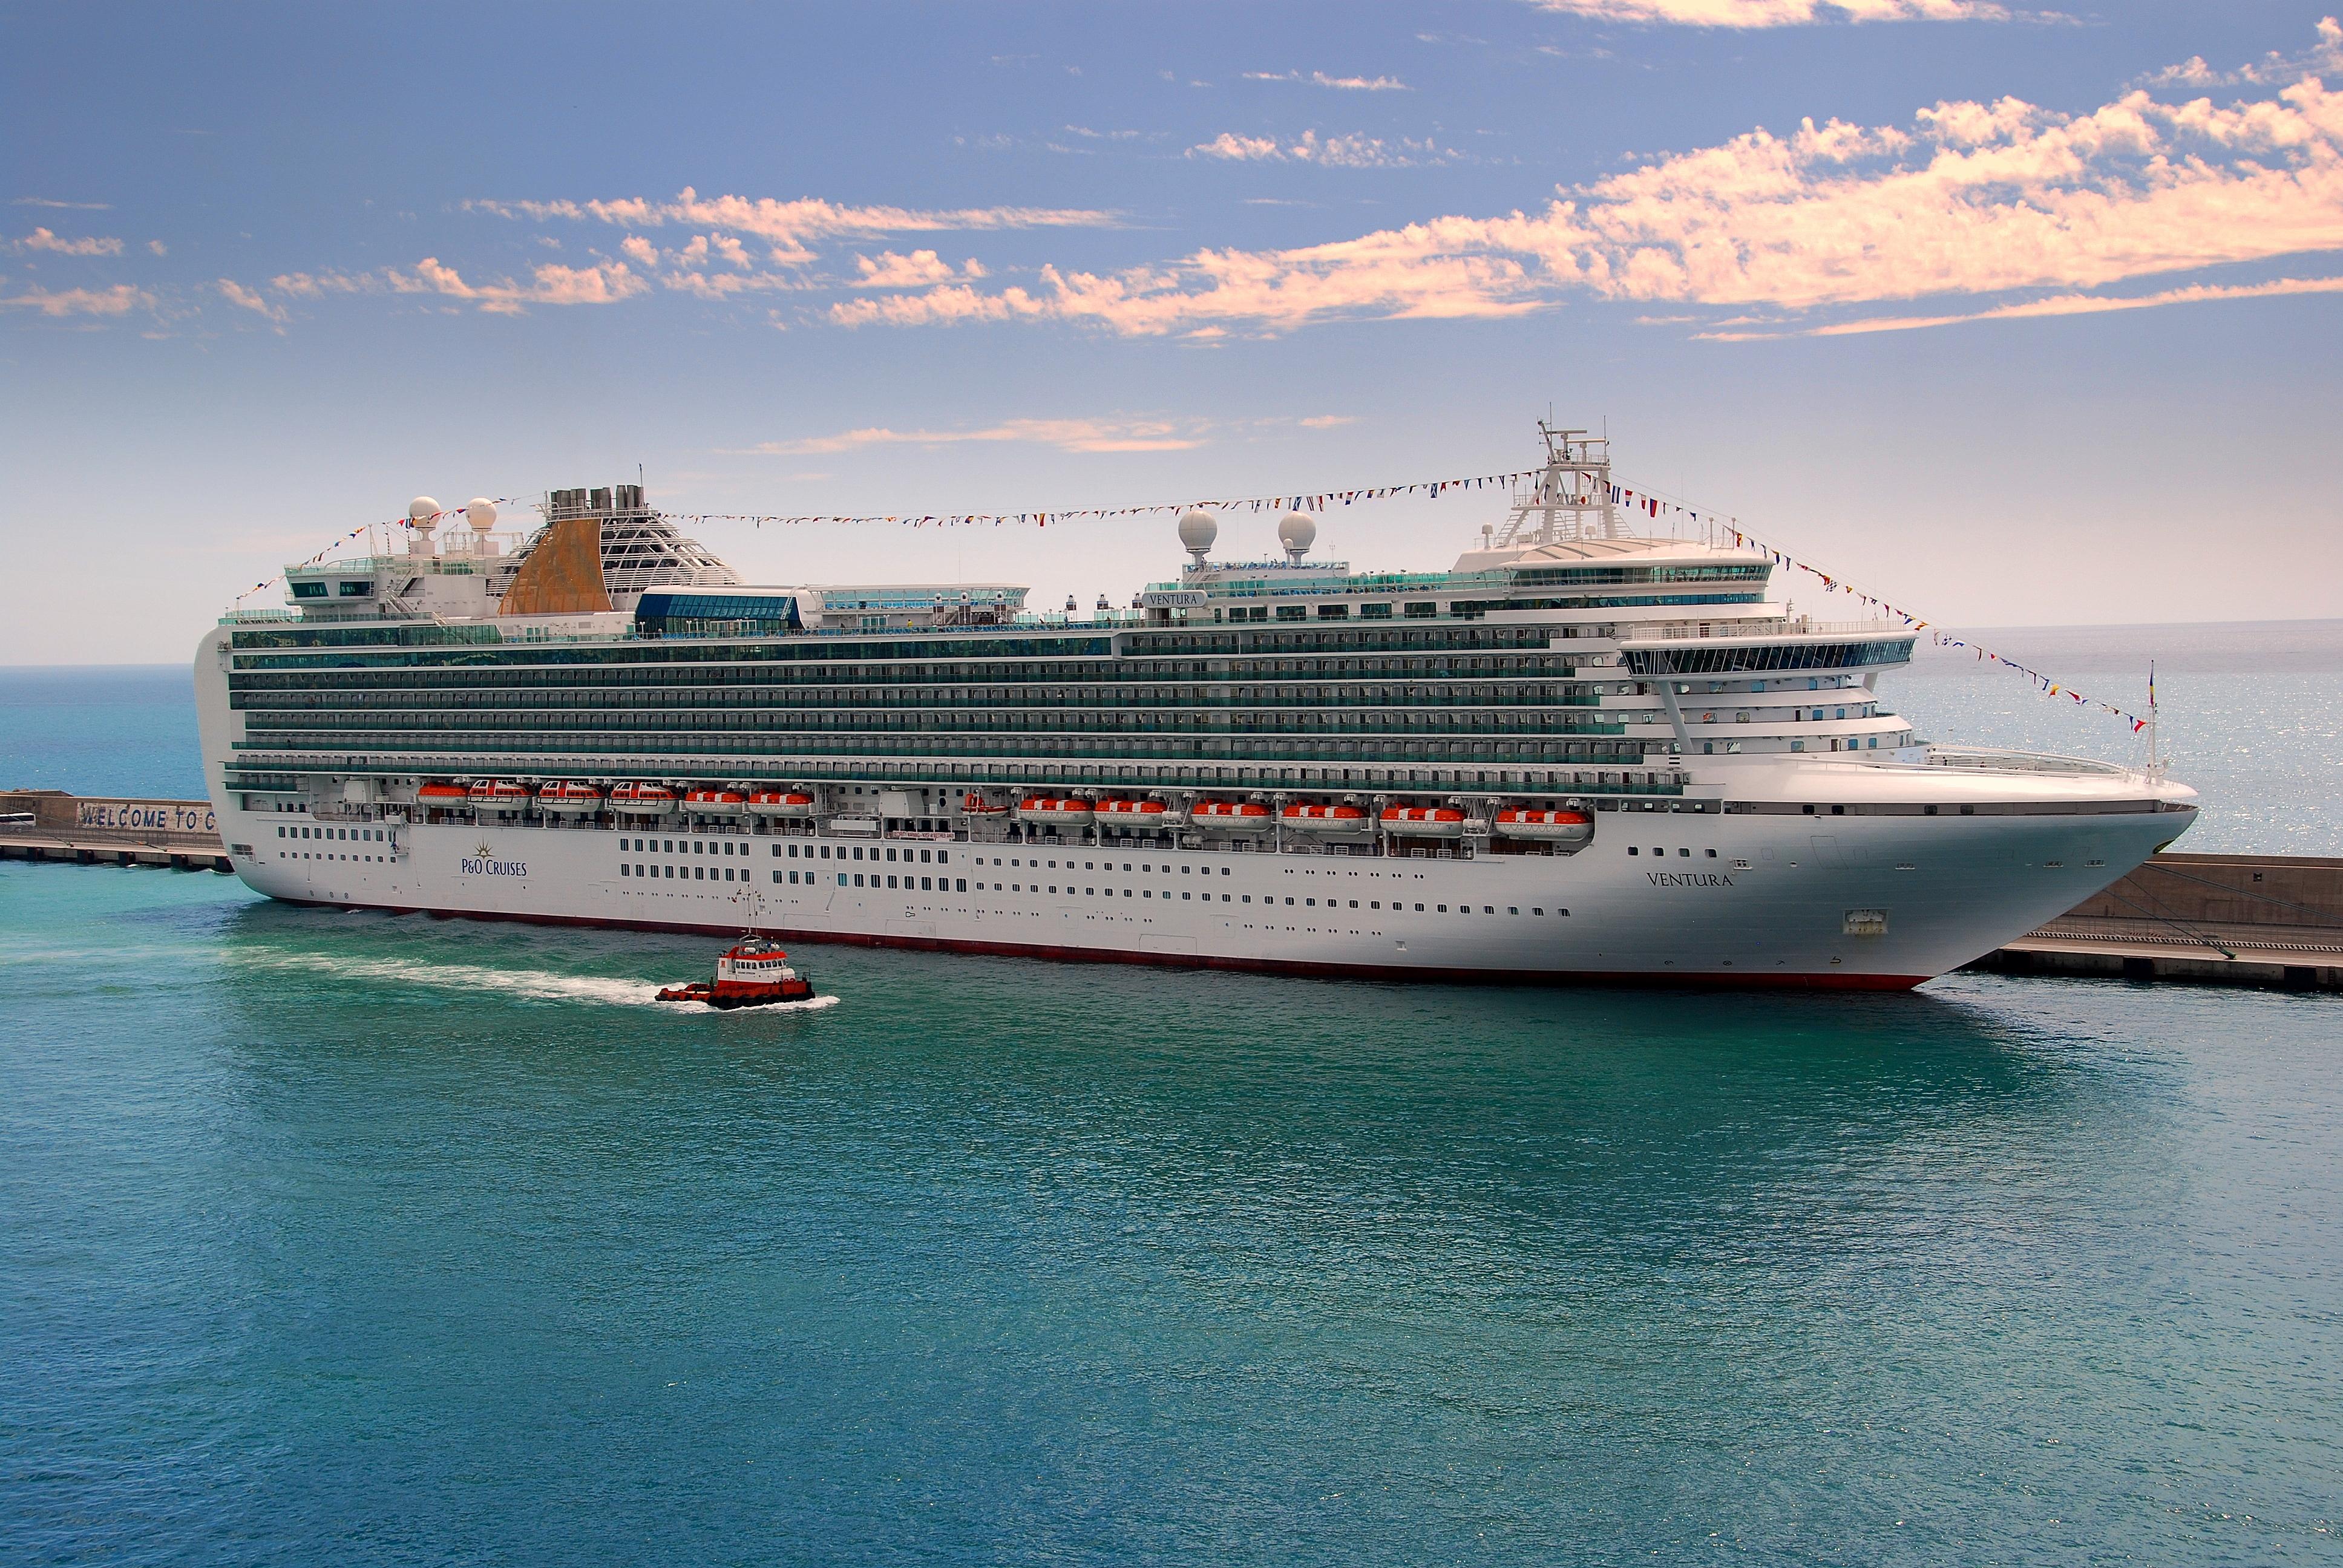 FileMSVenturaPOCruisesjpg Wikimedia Commons - P and o cruises ships